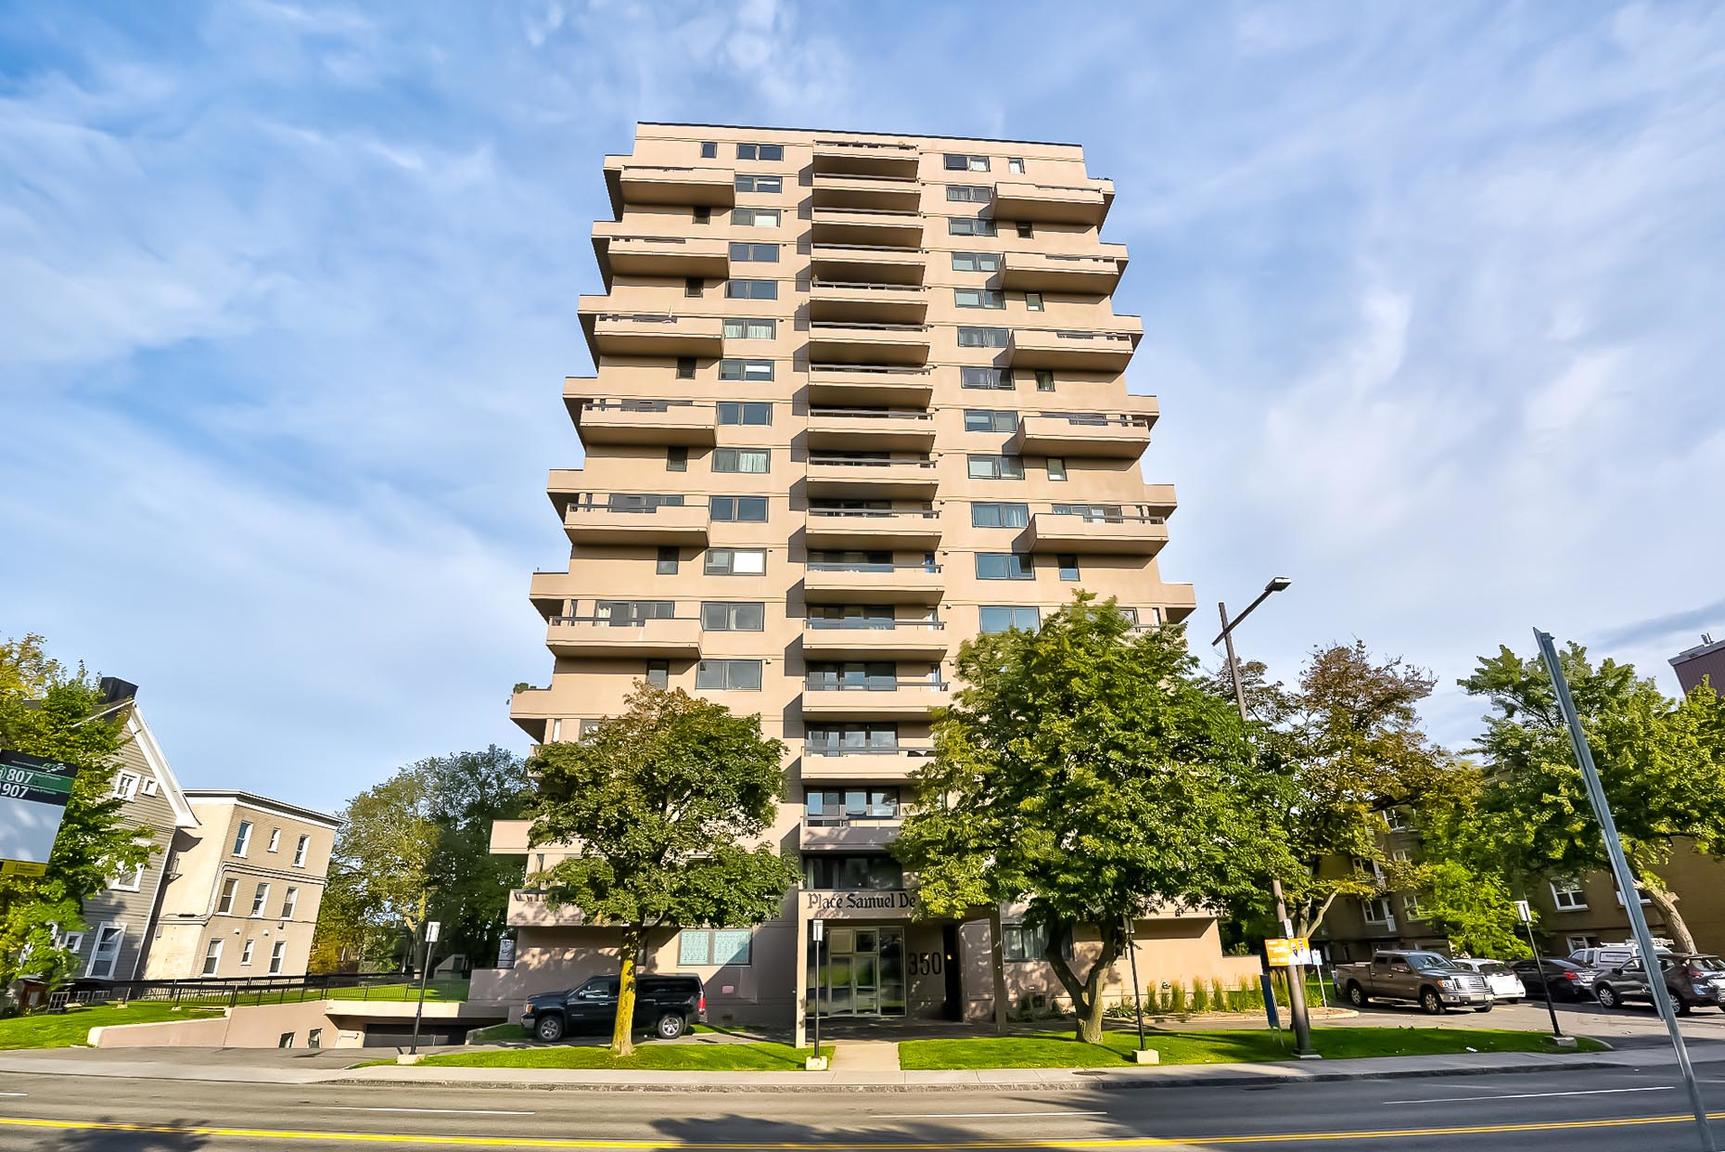 1 bedroom Apartments for rent in Quebec City at Place Samuel de Champlain - Photo 19 - RentersPages – L407129